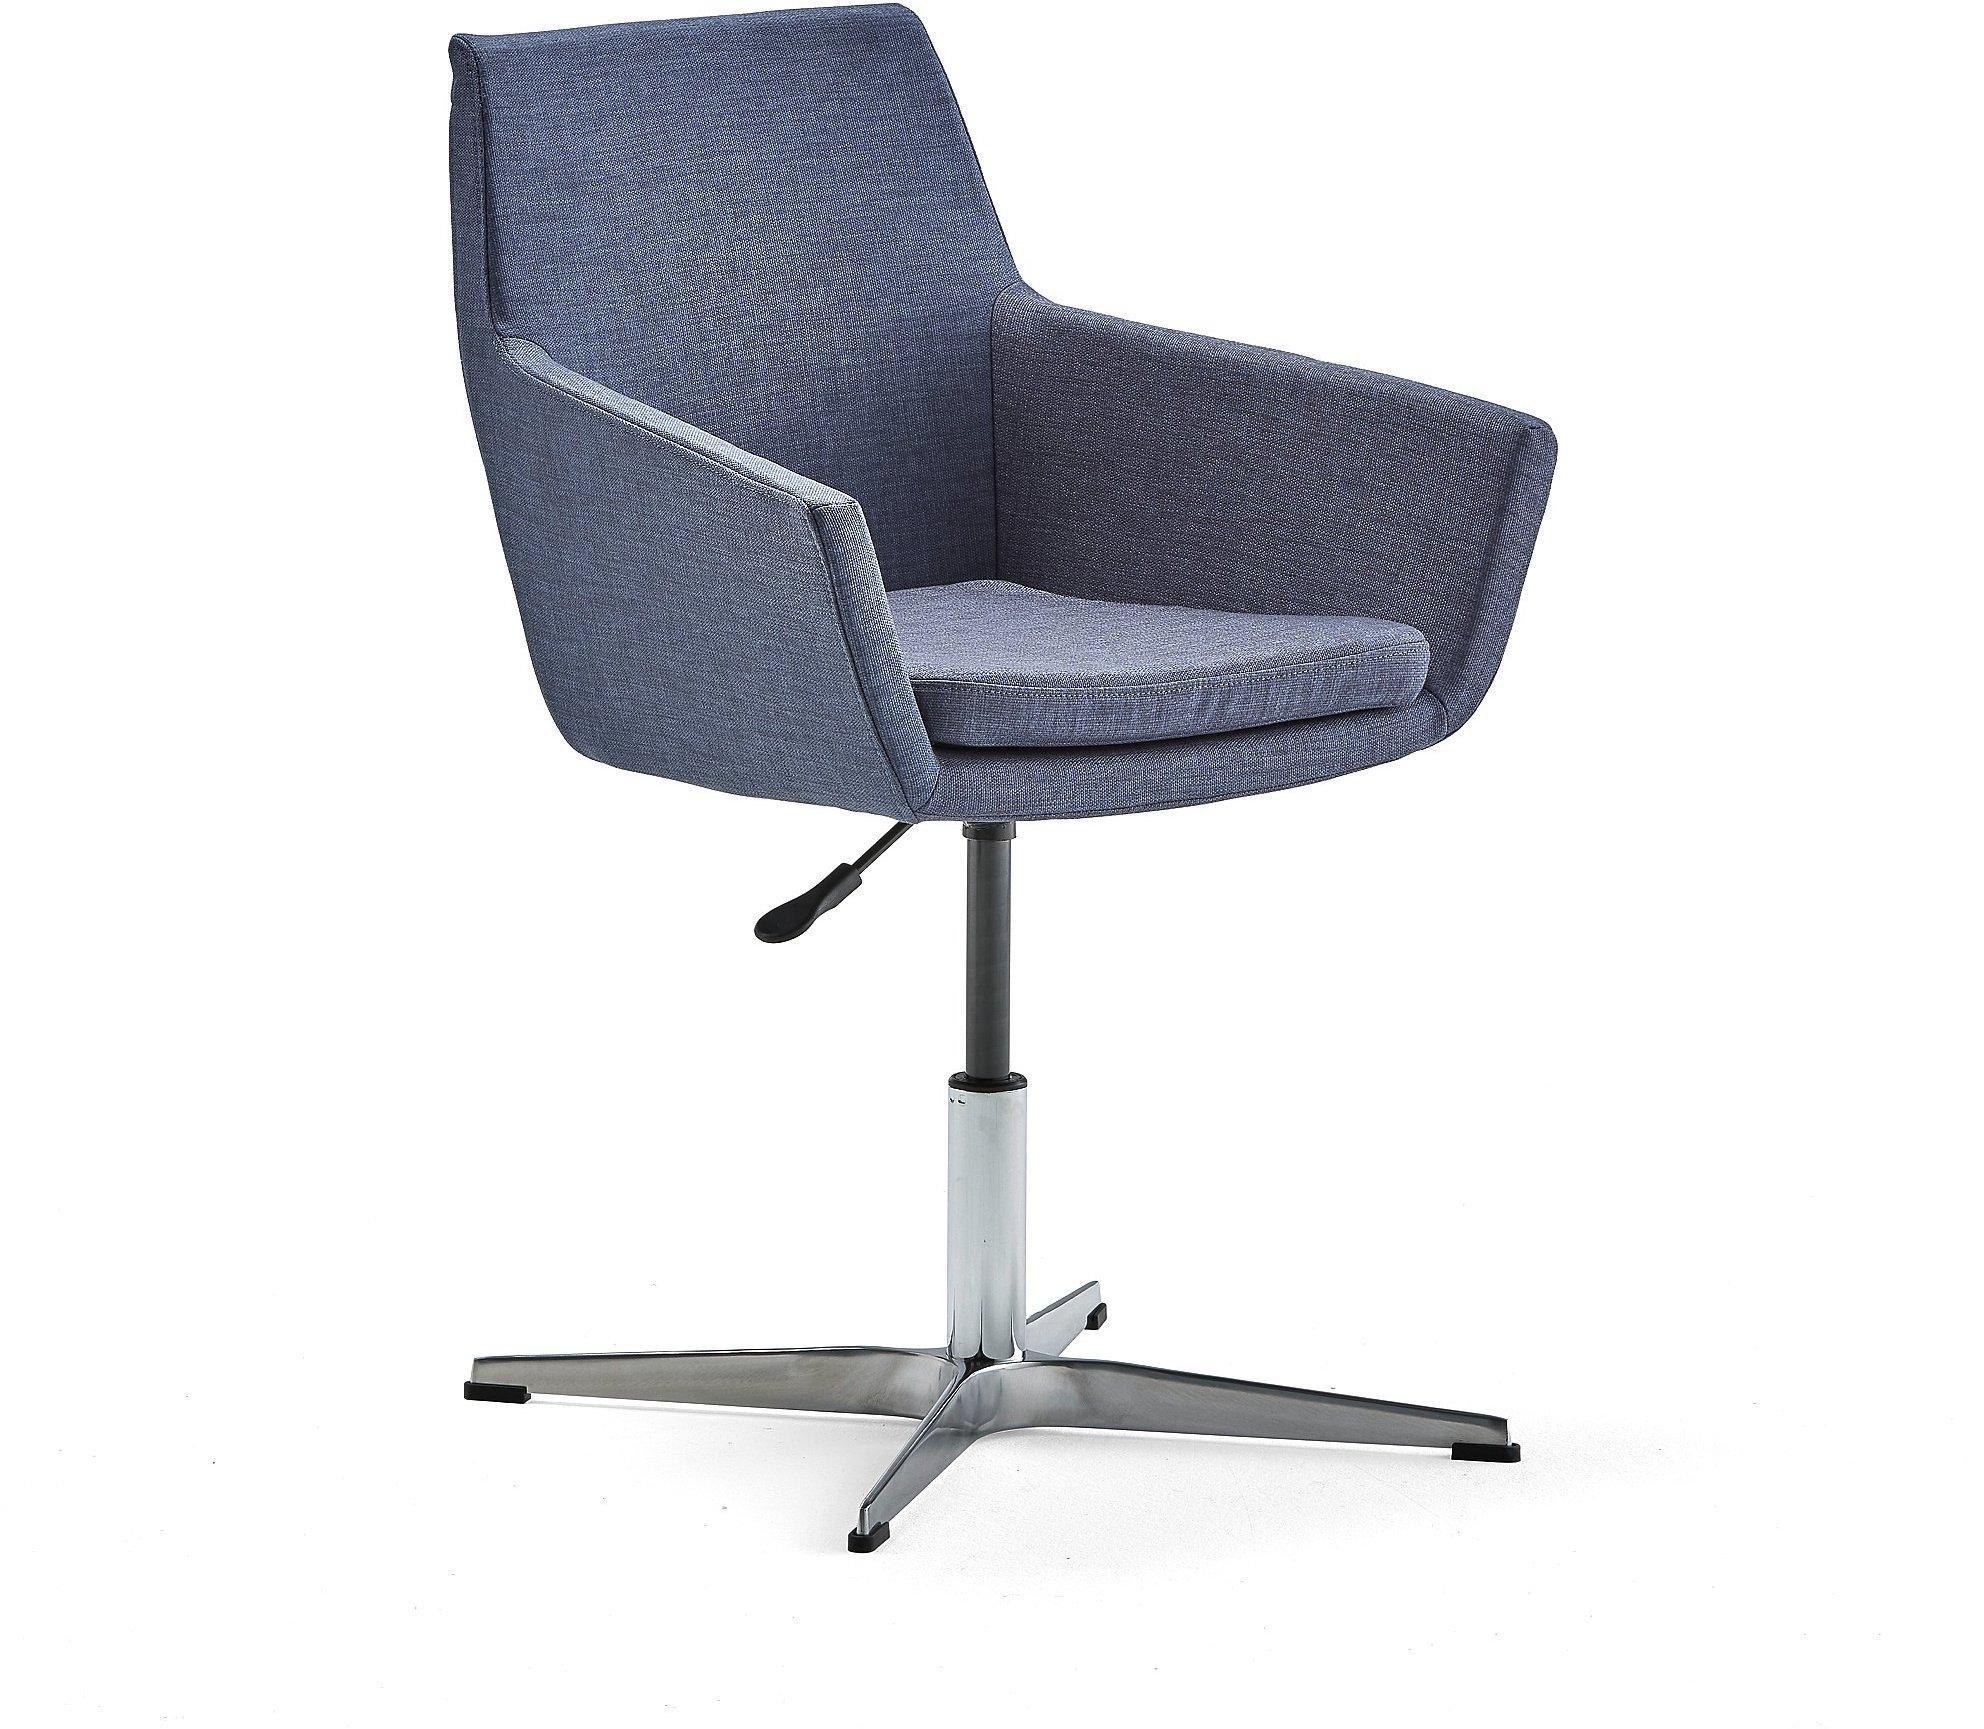 Konferenčná stolička Fairfield, leštený hliník, modrošedá